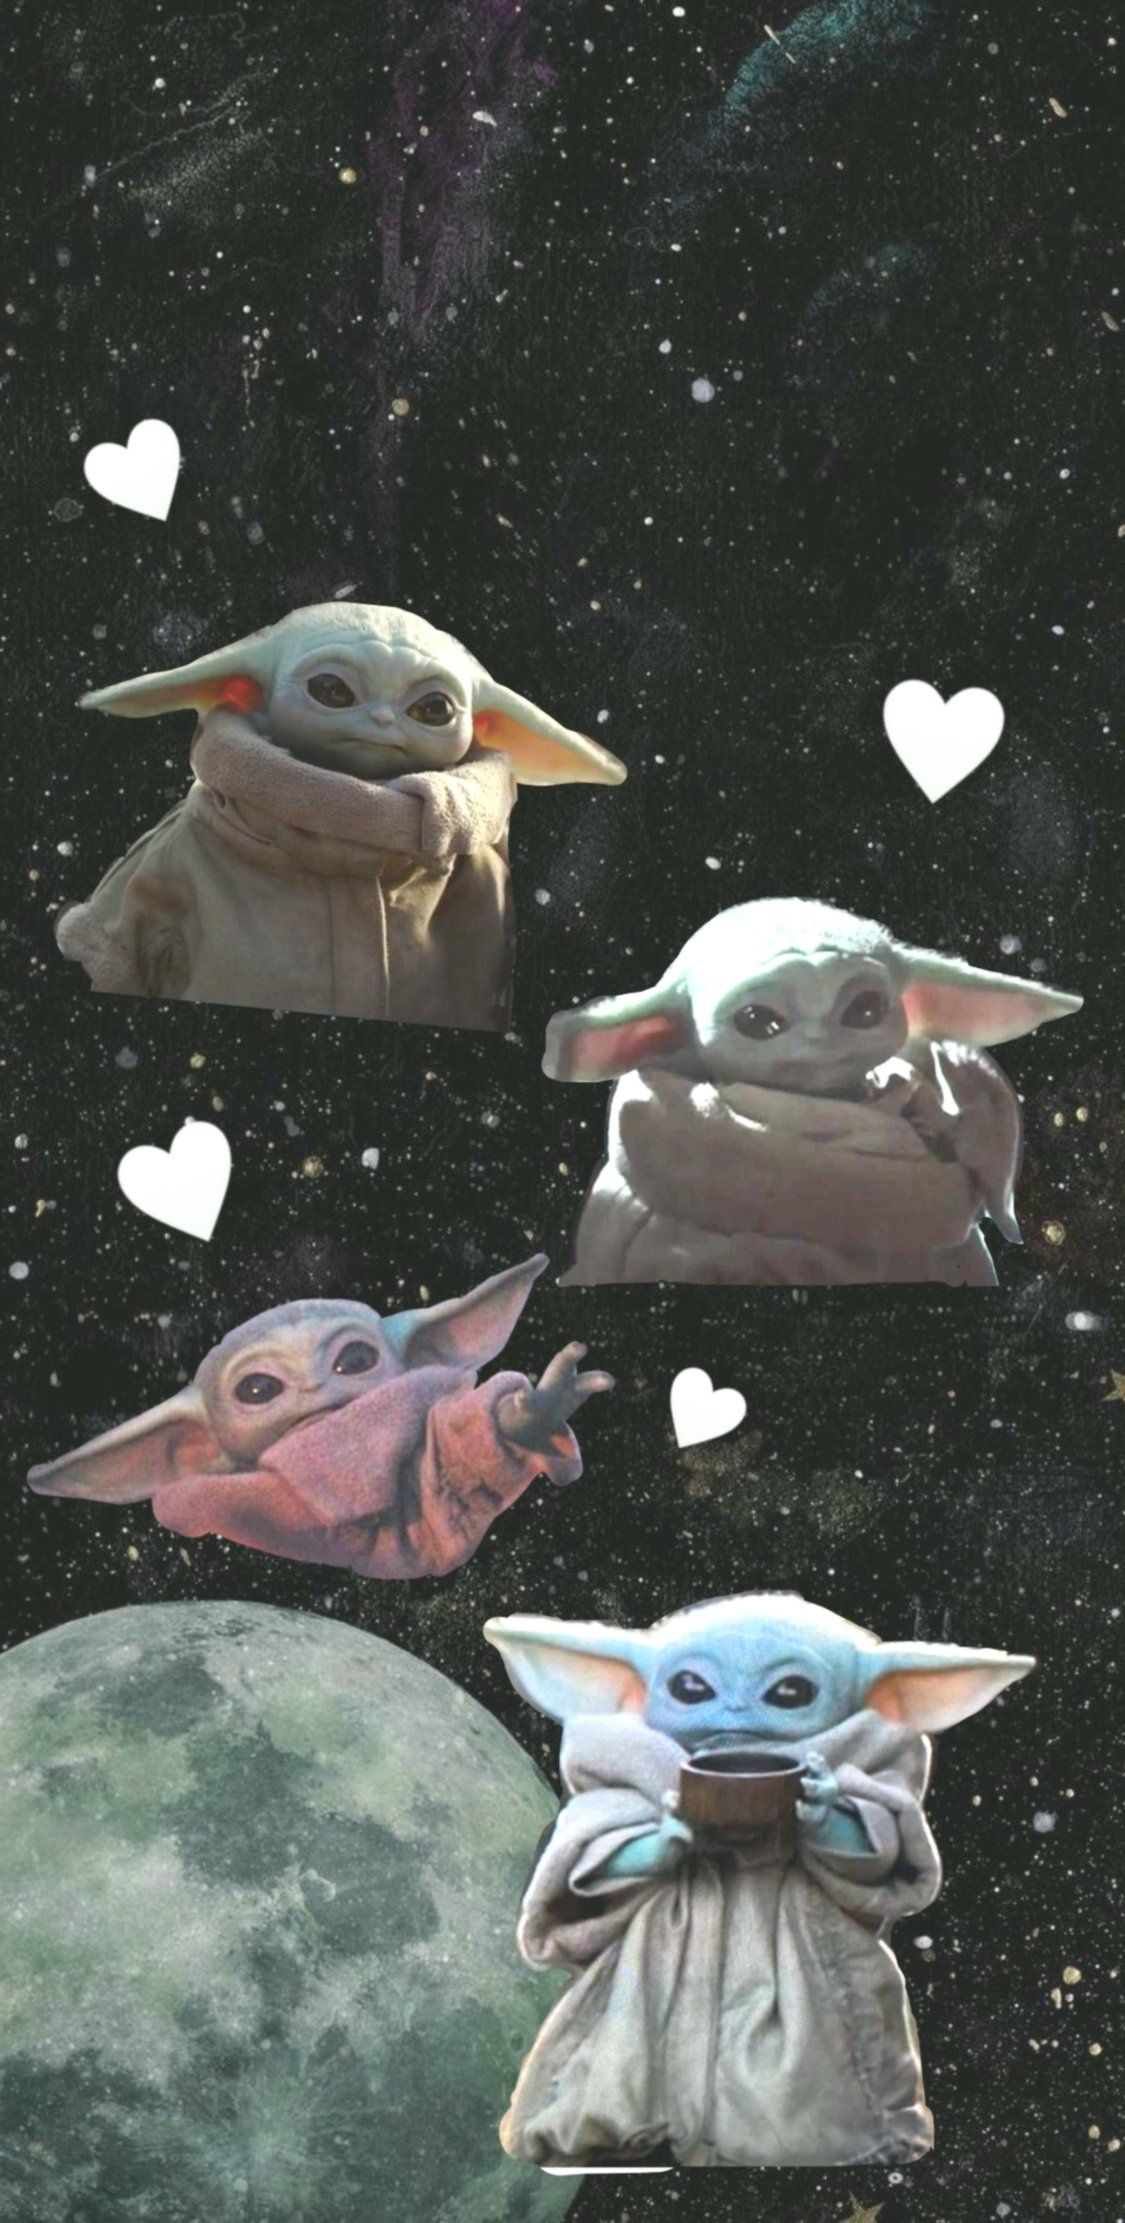 Baby Yoda Baby Yoda Lockscreen Wallpaper Baby Yoda Babyyoda Wallpaper Lock Yoda Star Wars Memes Wallpaper